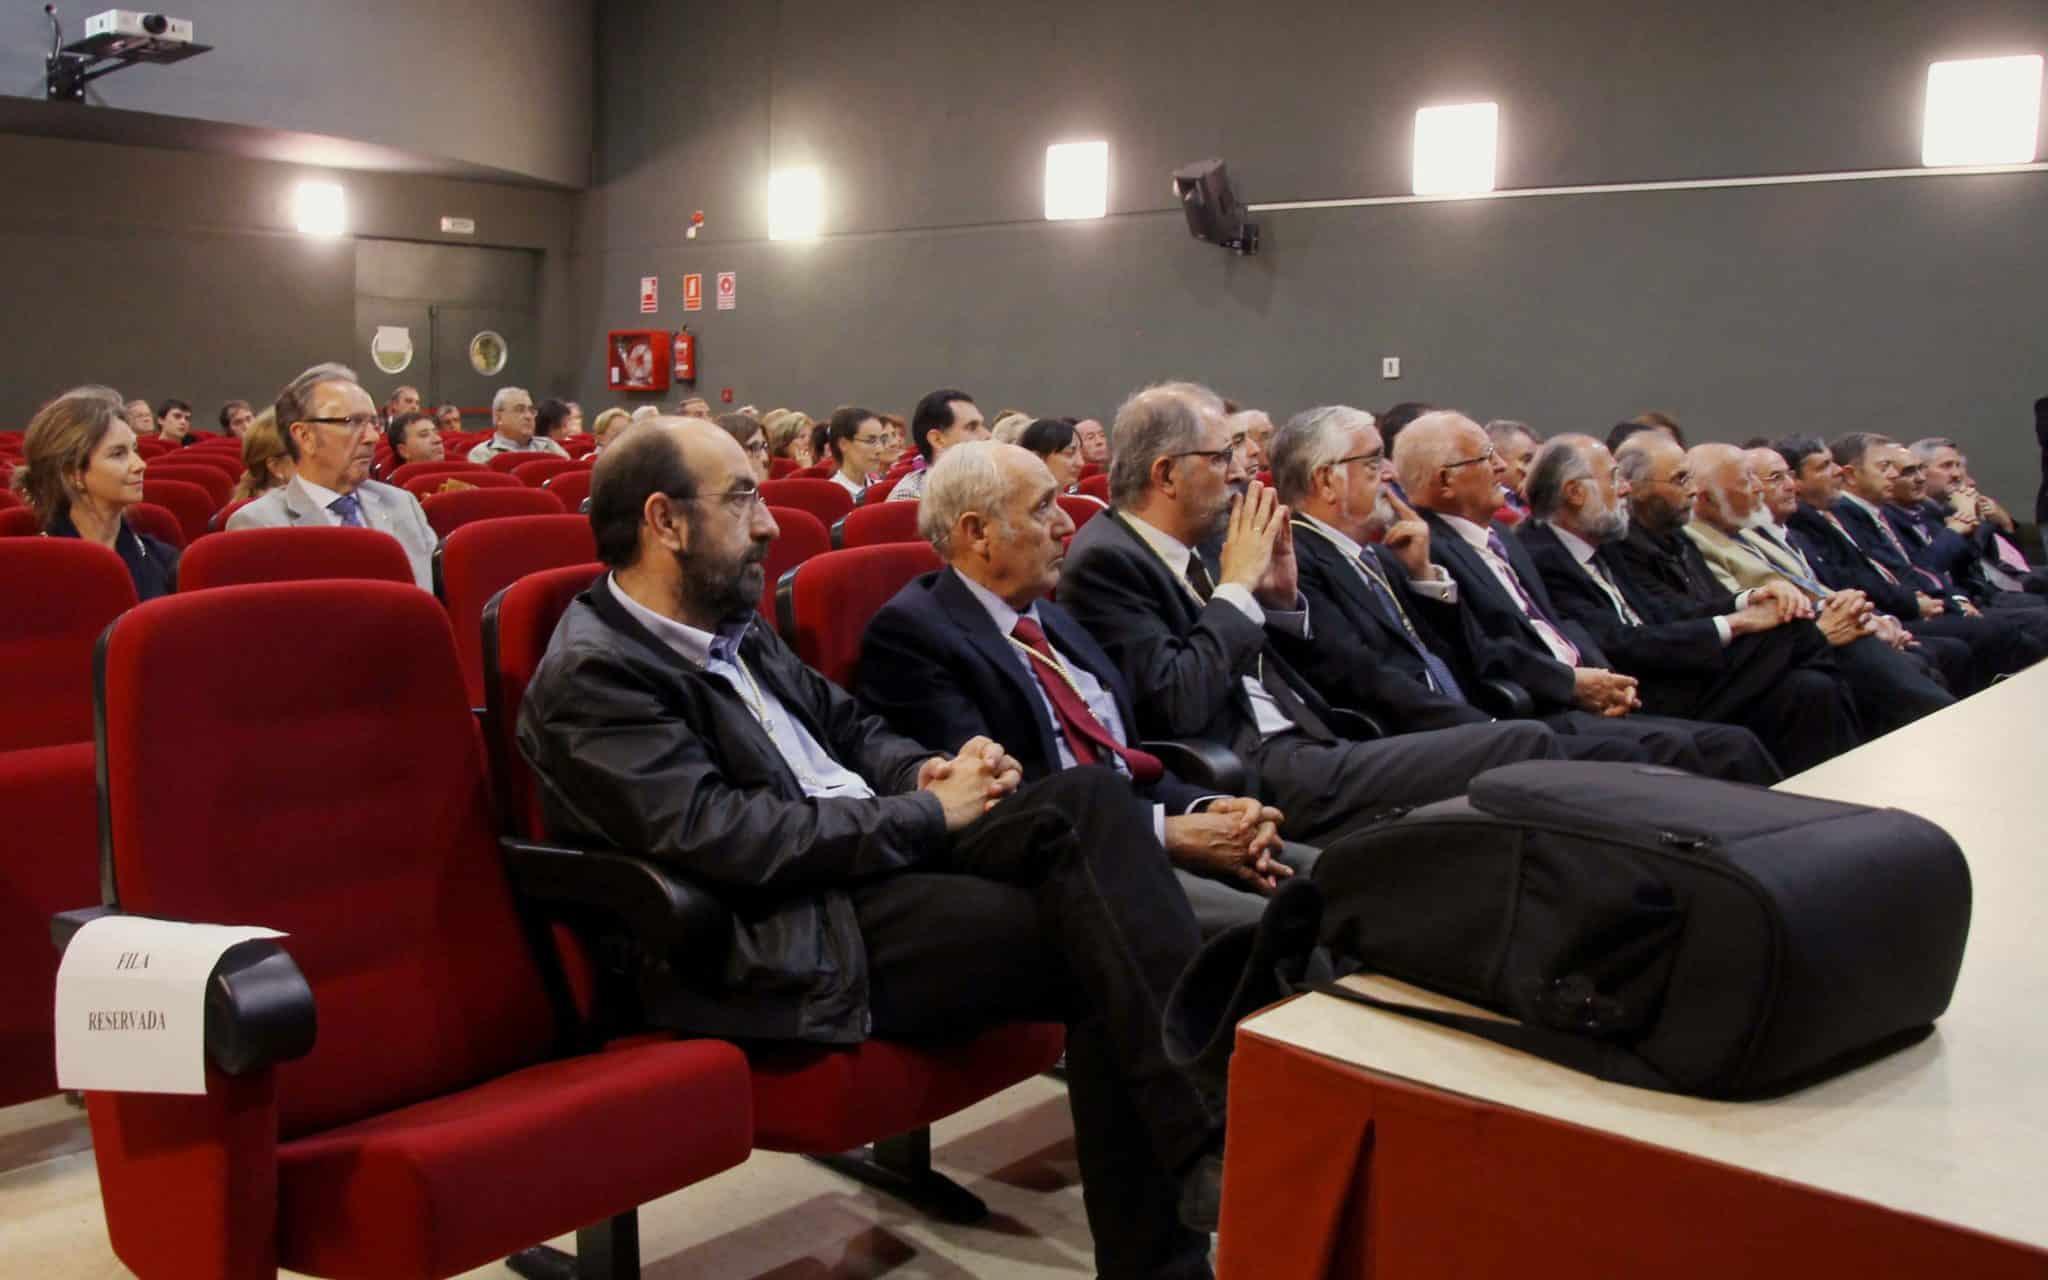 https://blog.globalcaja.es/wp-content/uploads/2015/10/RACAL_inauguracion-curso-2015-16-014_R.jpg